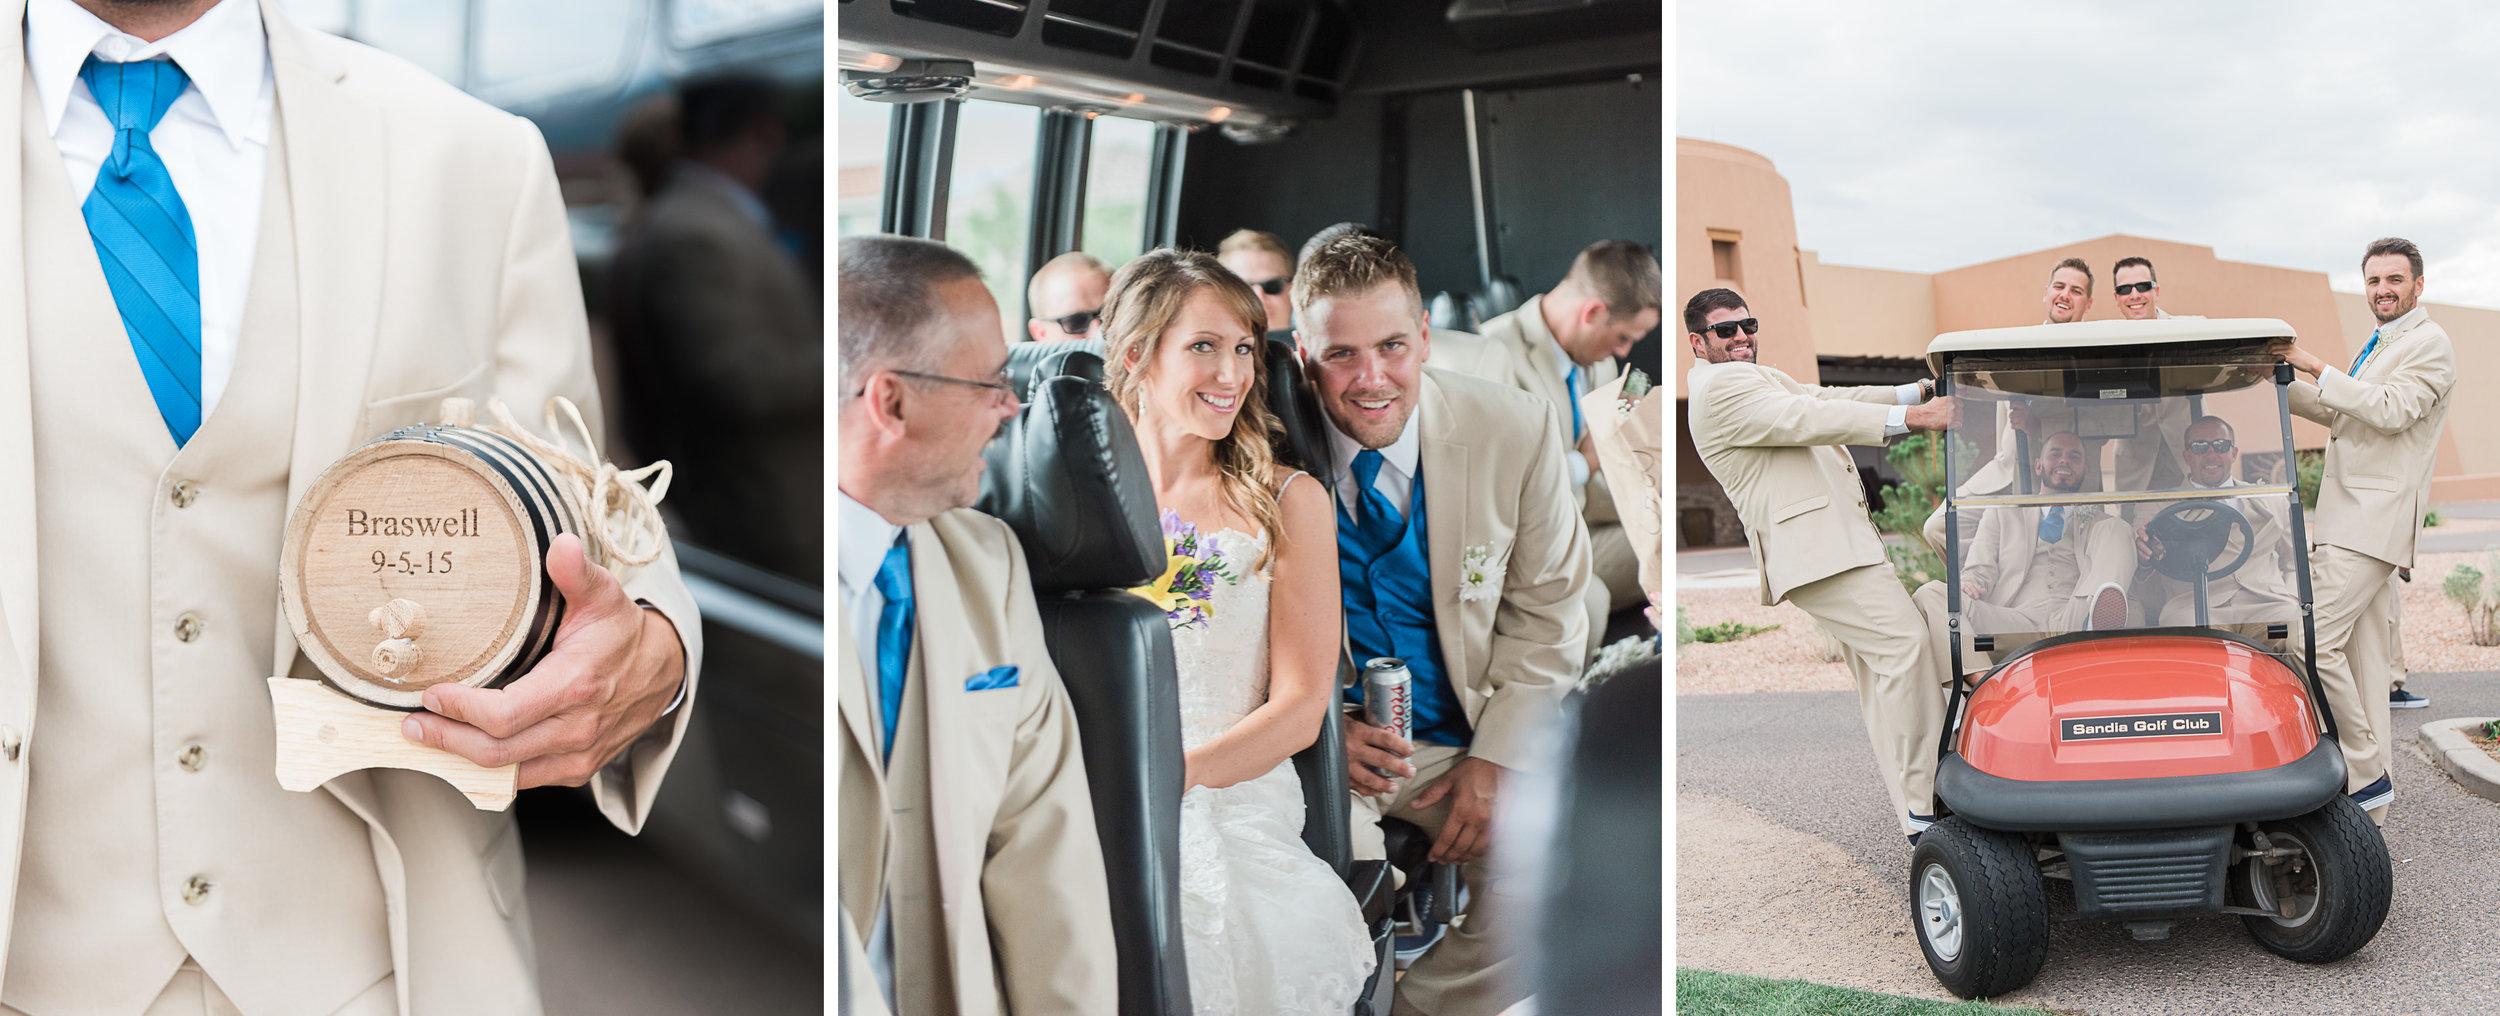 braswell wedding blog.jpg